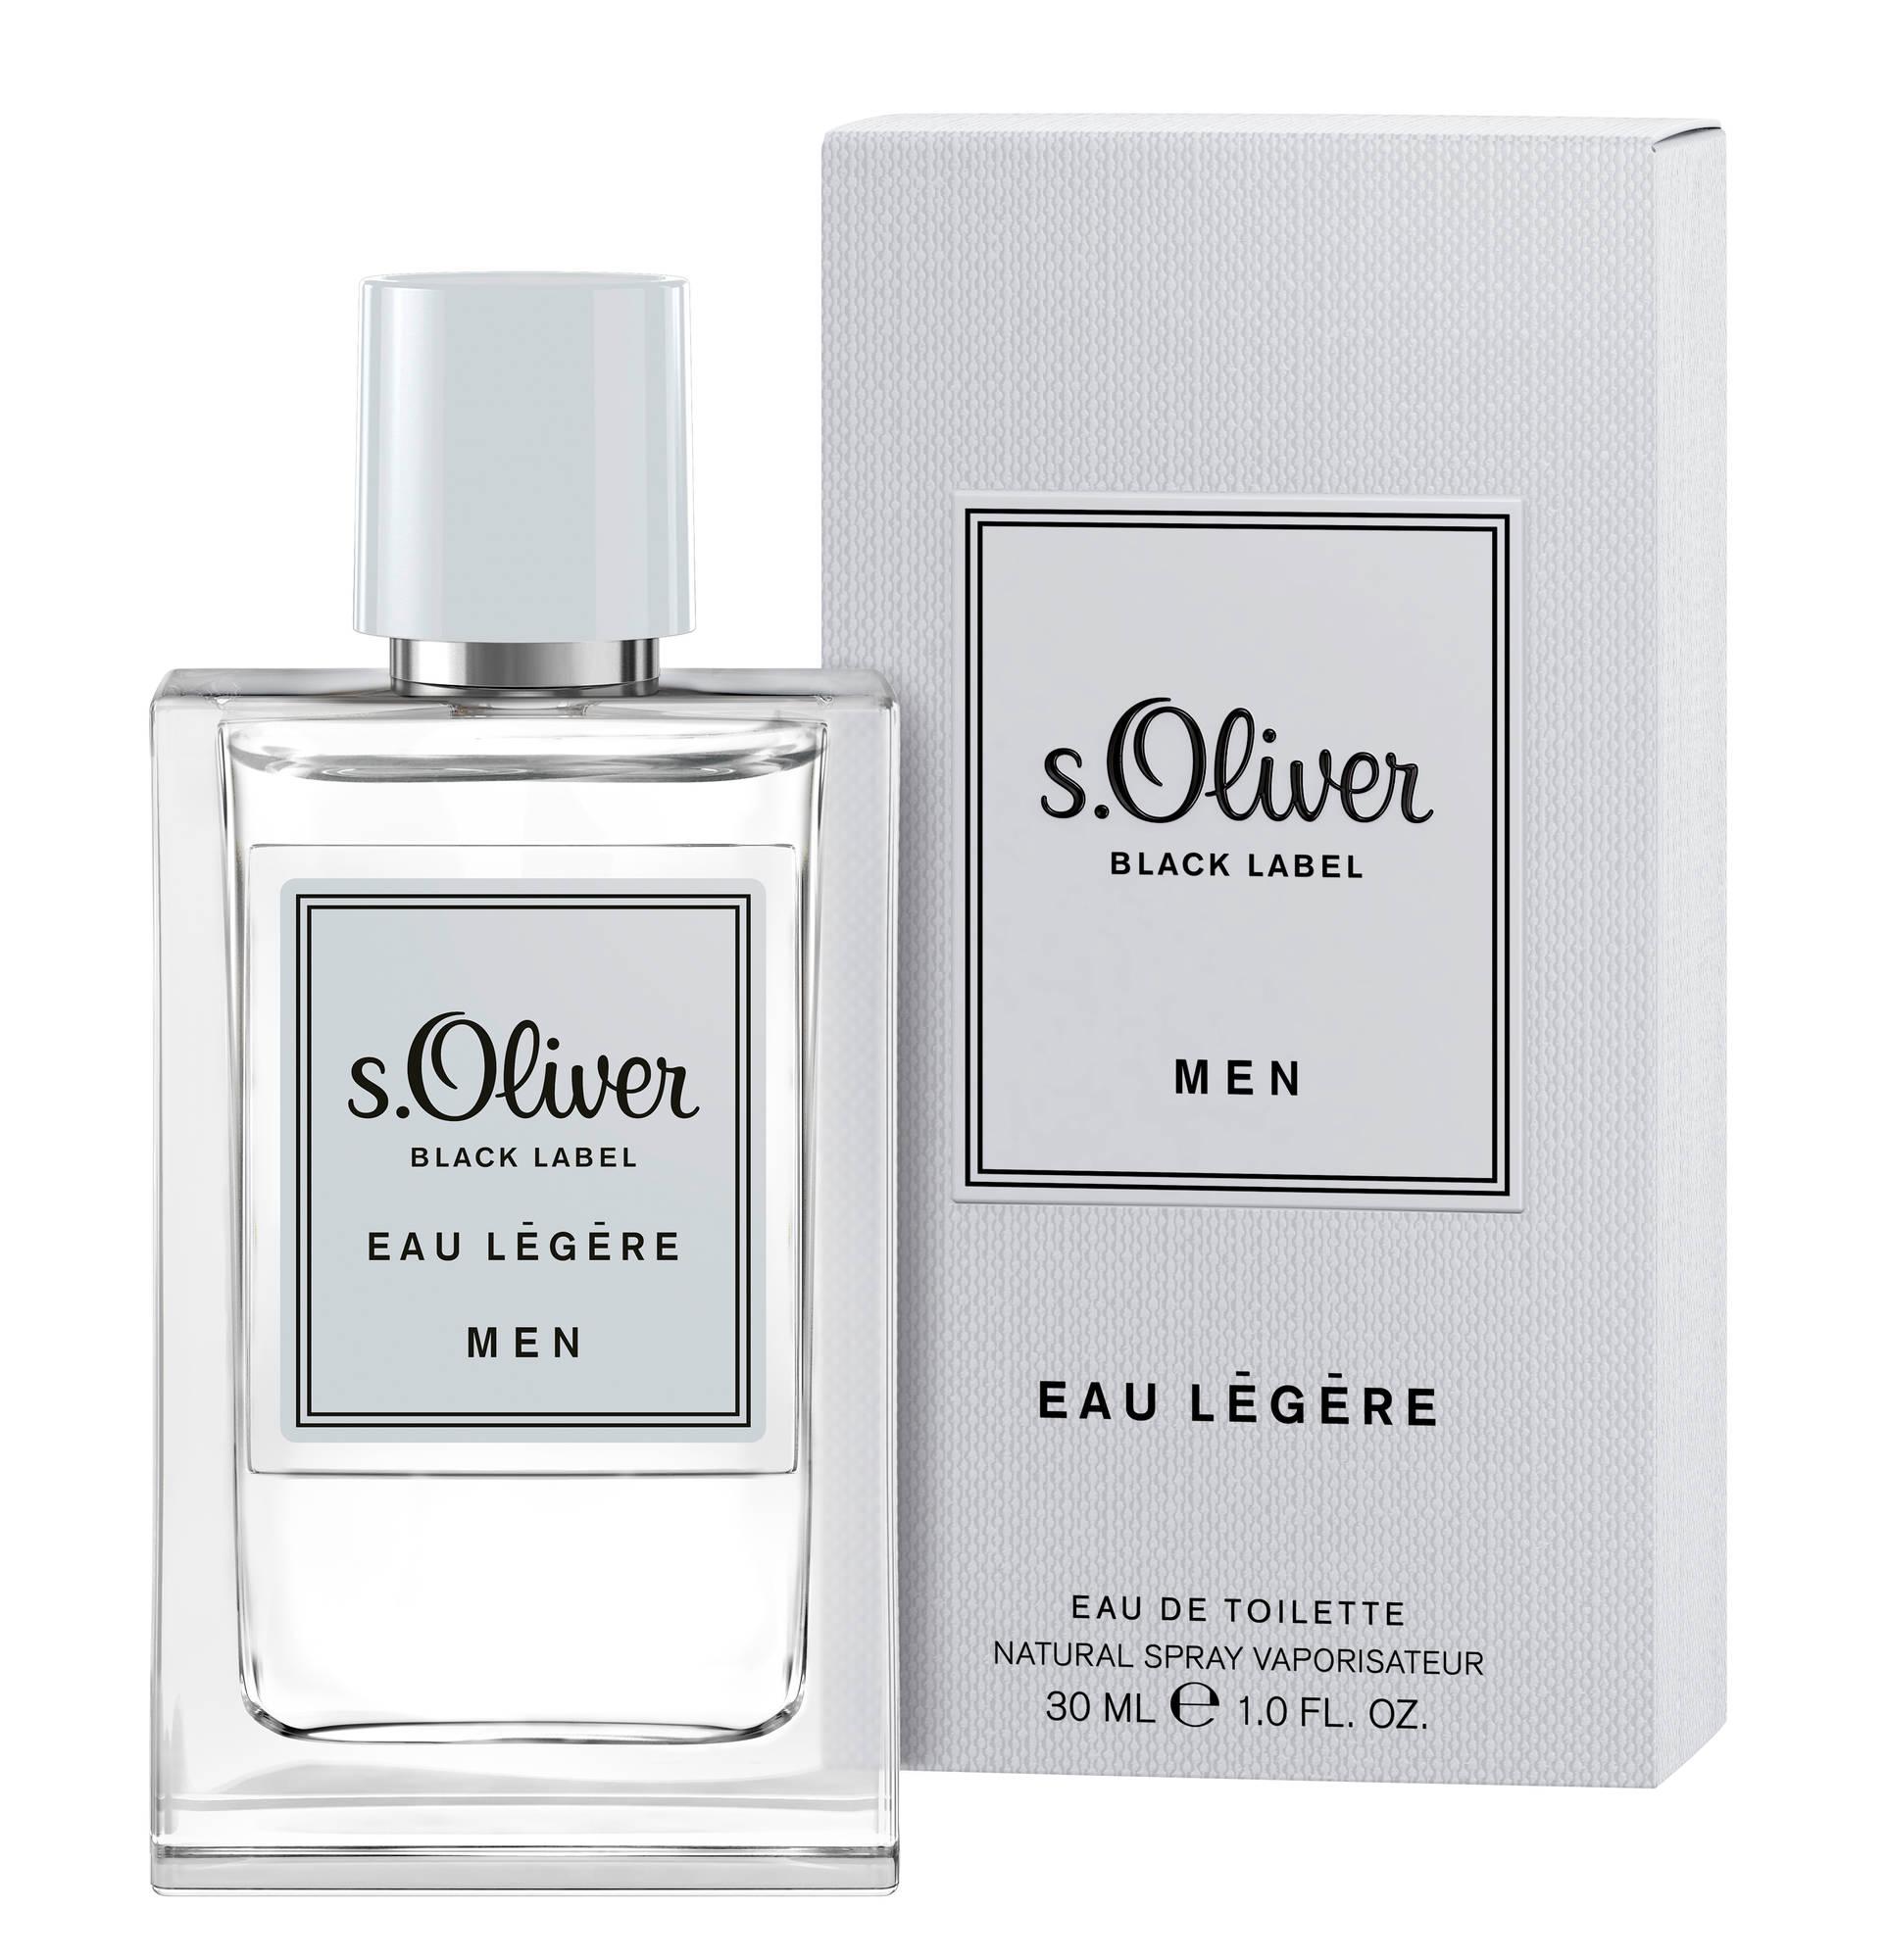 S.Oliver Black Label for Men eau Légere, edt 30ml